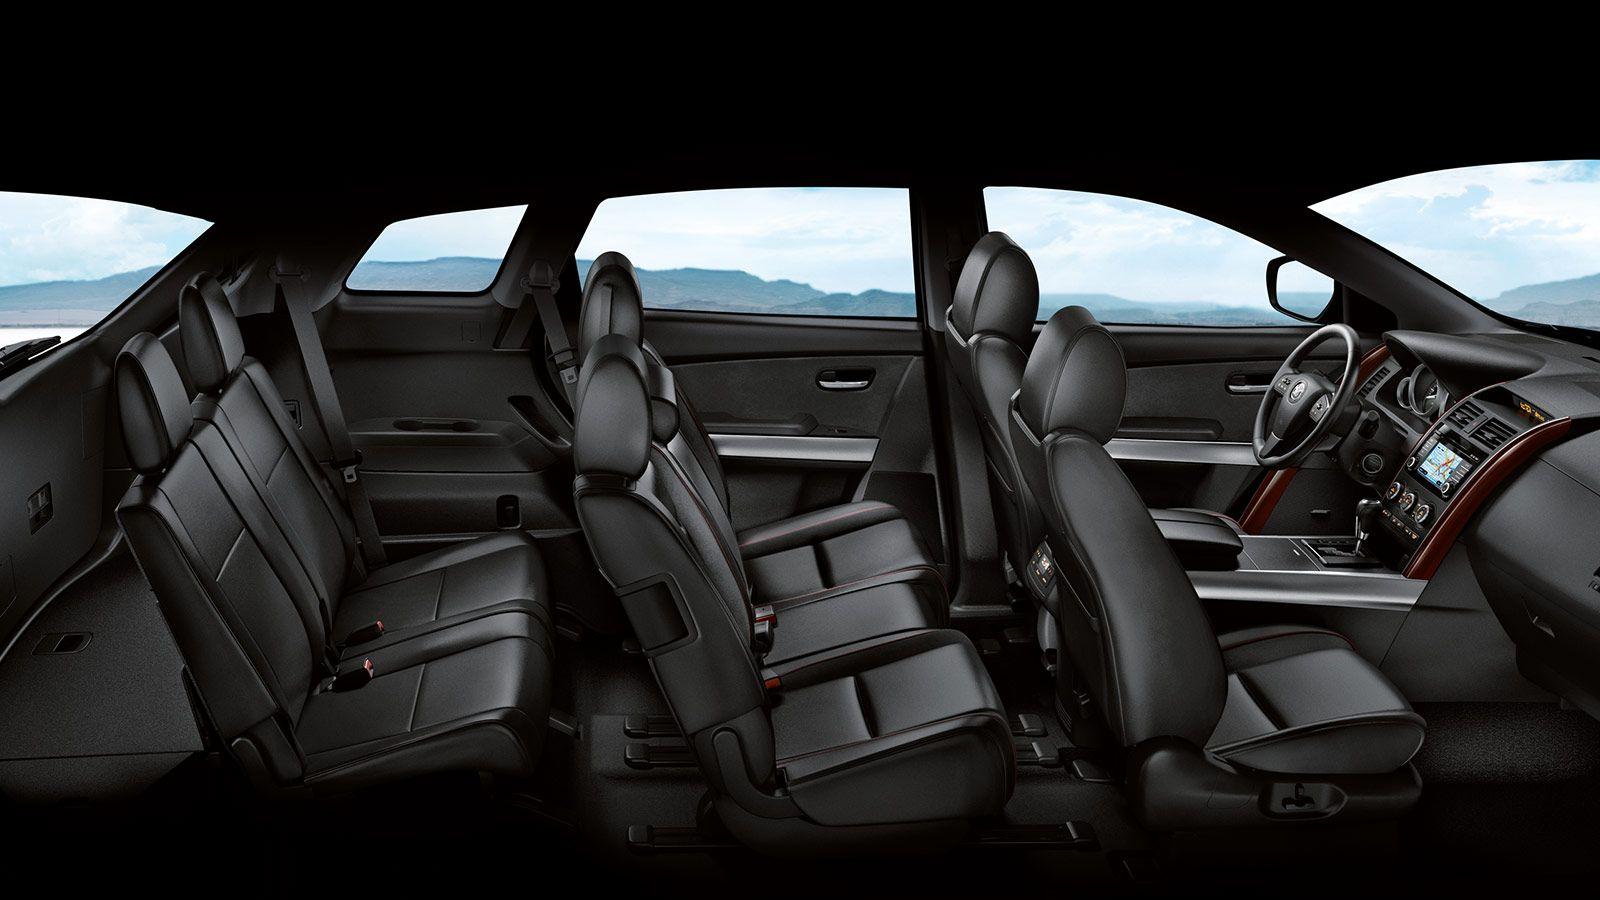 Mazda Cx 9 Interior Design Http Flanaganmotors Com Mazda Cx 9